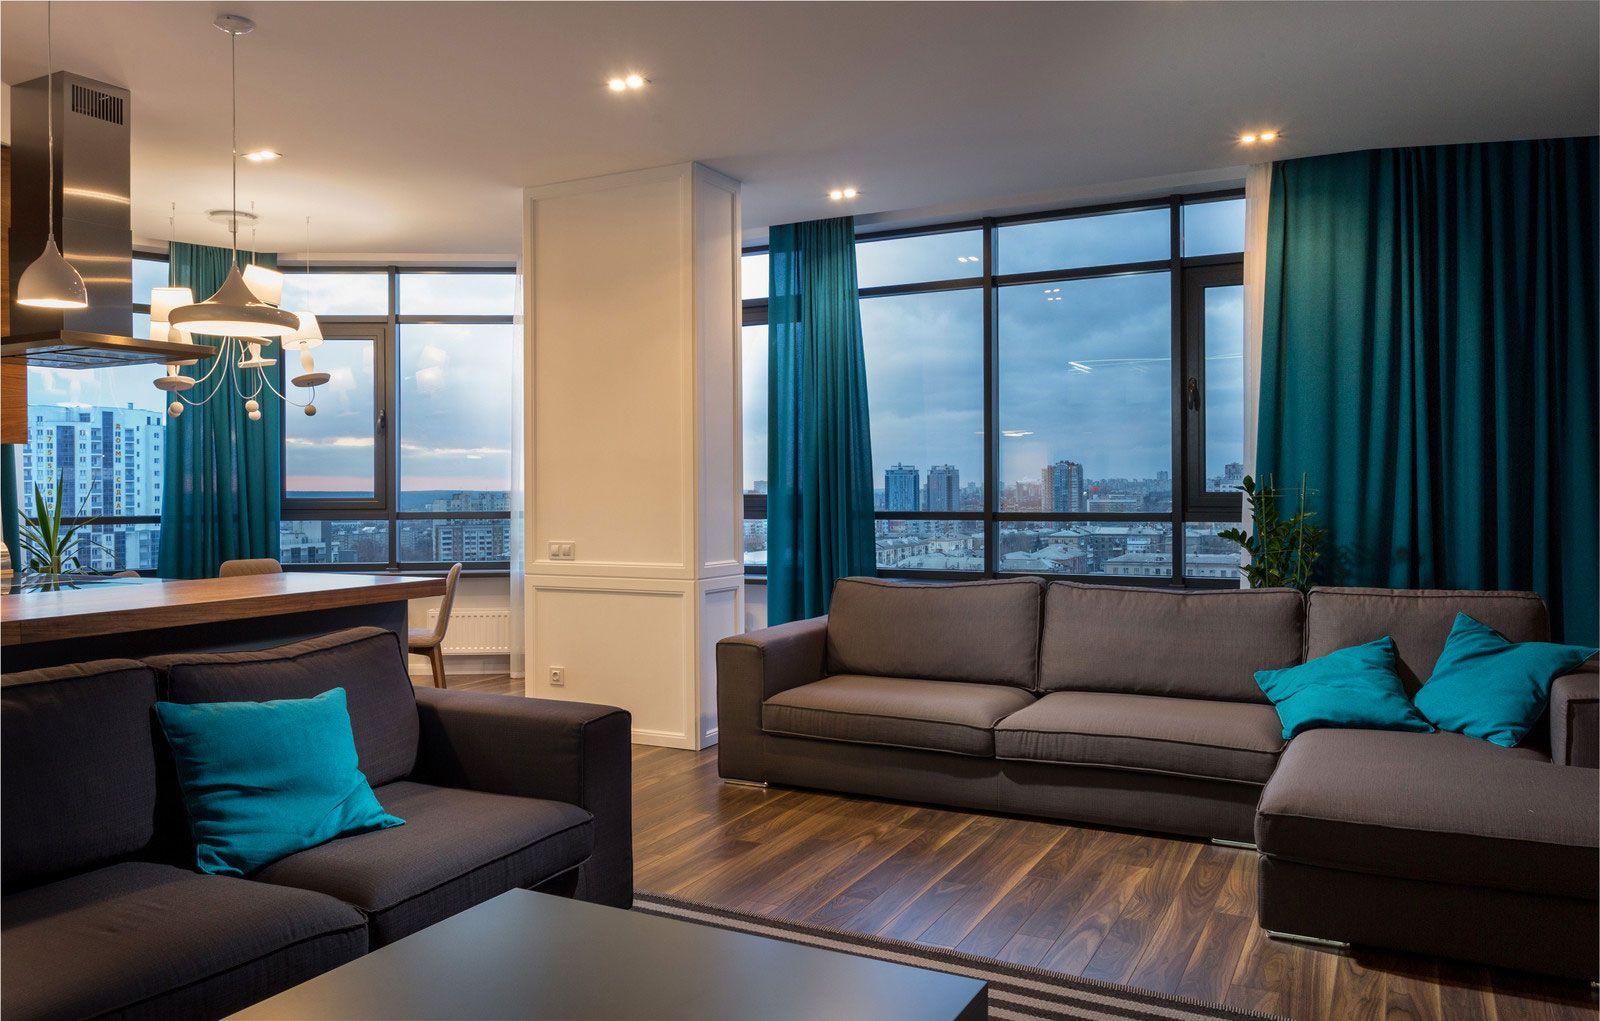 apartmentlivingroomaccentedblueapartmentforyour